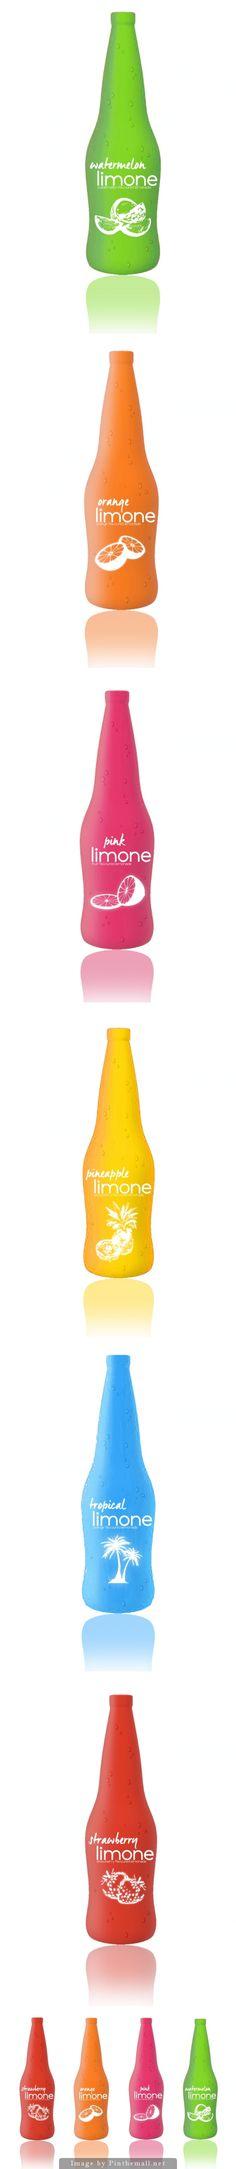 packag beverag, packag pd, packag design, limon packag